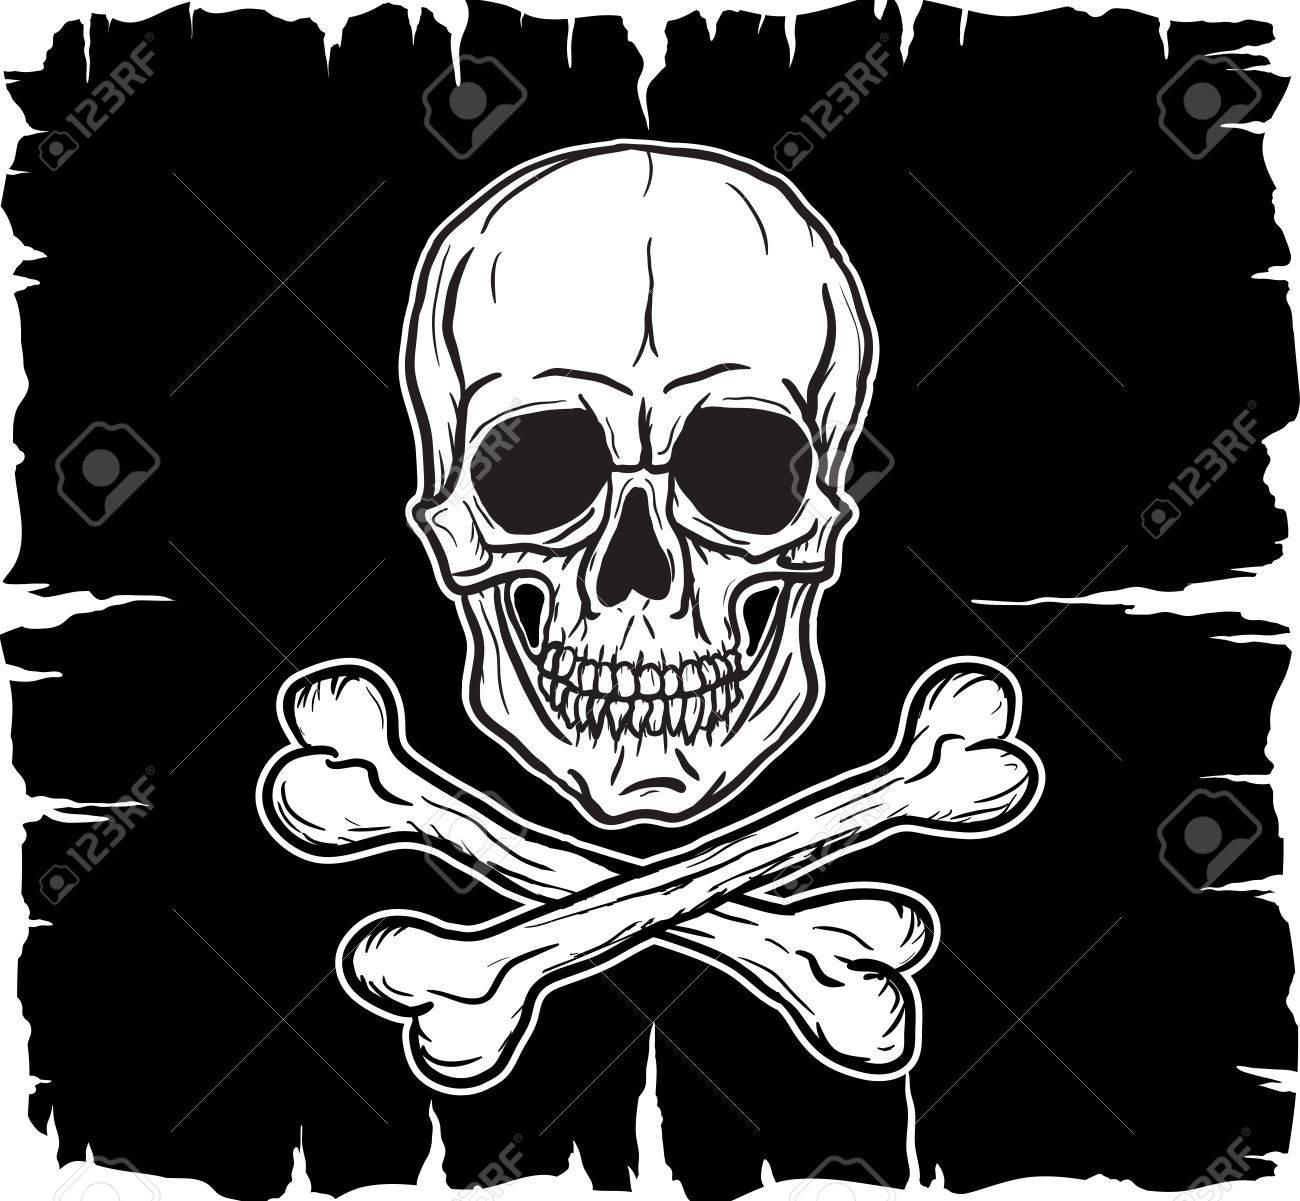 Skull and Crossbones over black flag Vector illustration - 14800596